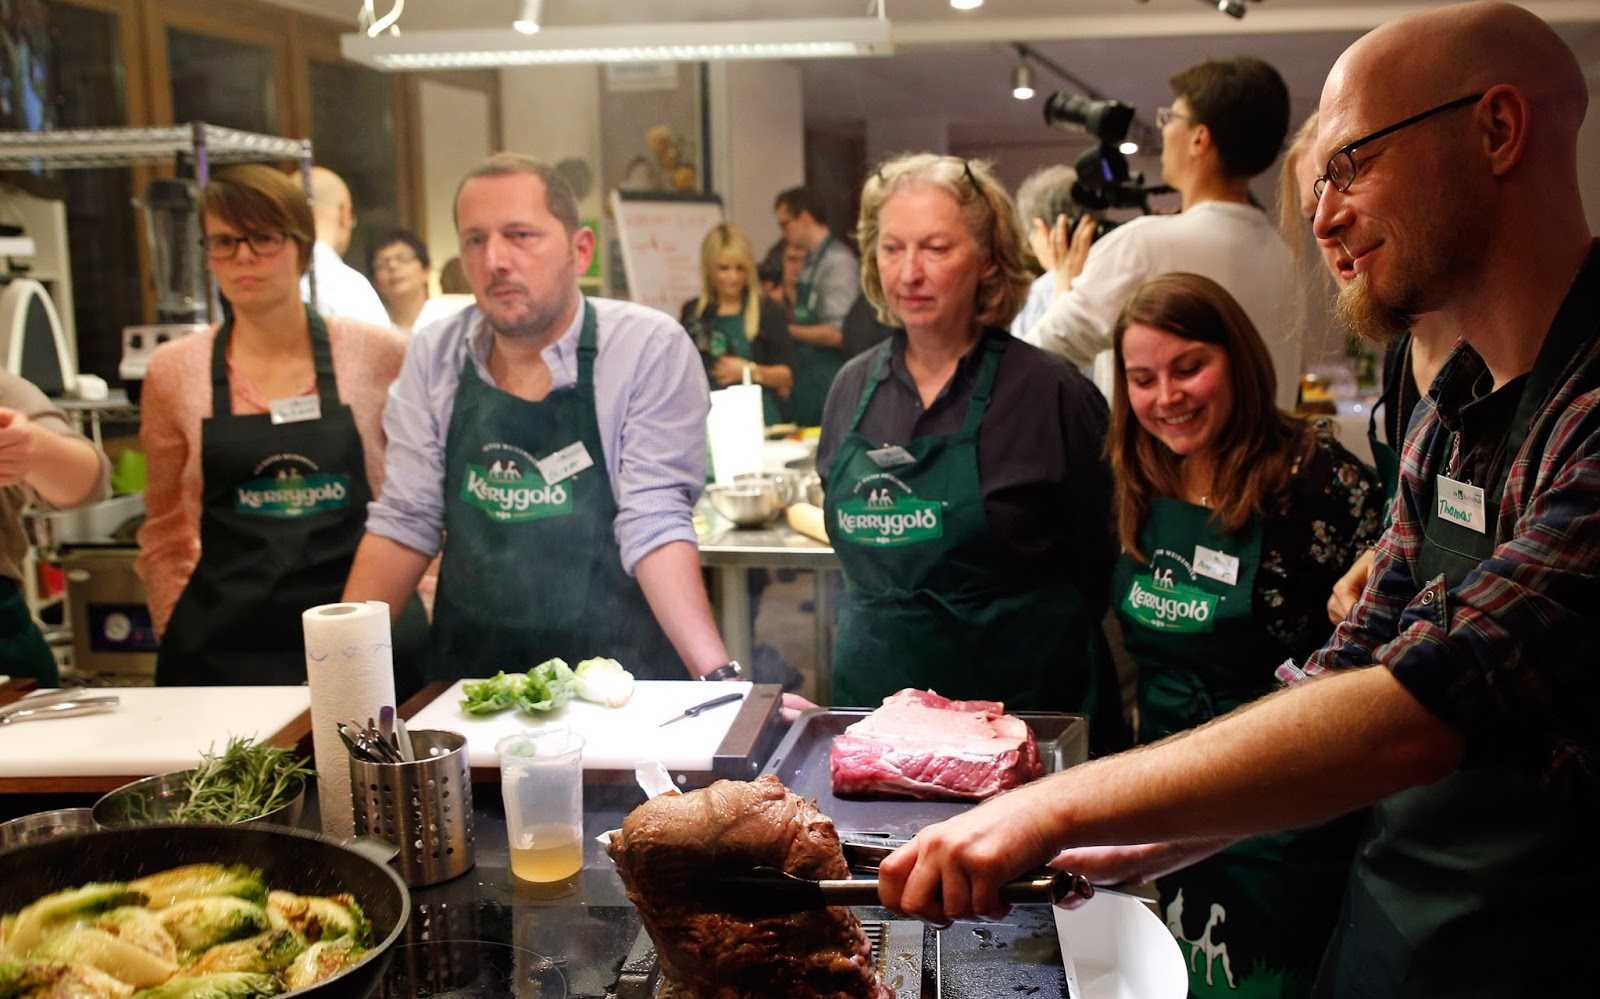 Miss B. unterwegs: Kerrygold Kulinarik-Gipfel 2014 in Berlin